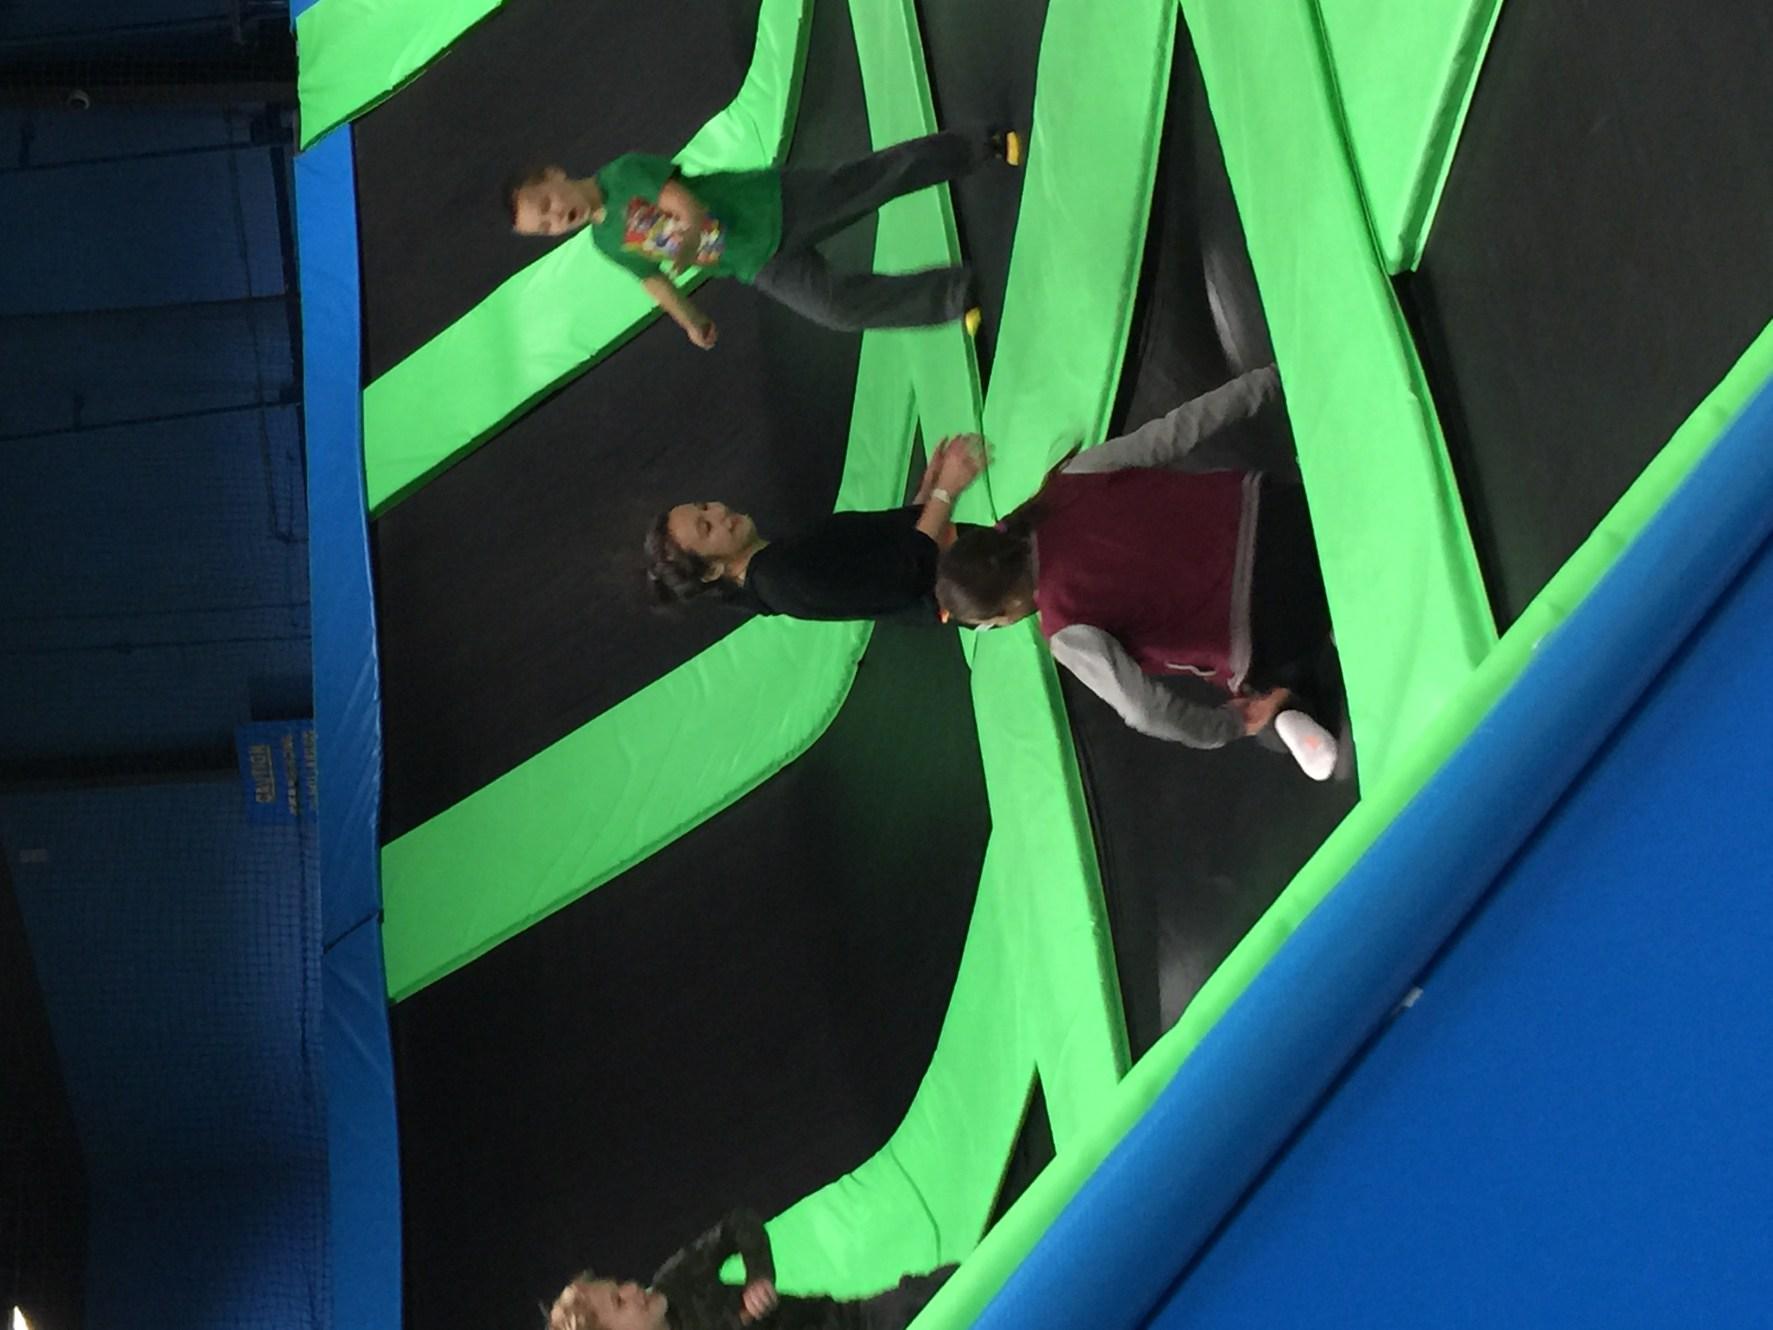 20150228 Phs LUMC Youth Bounce (35)